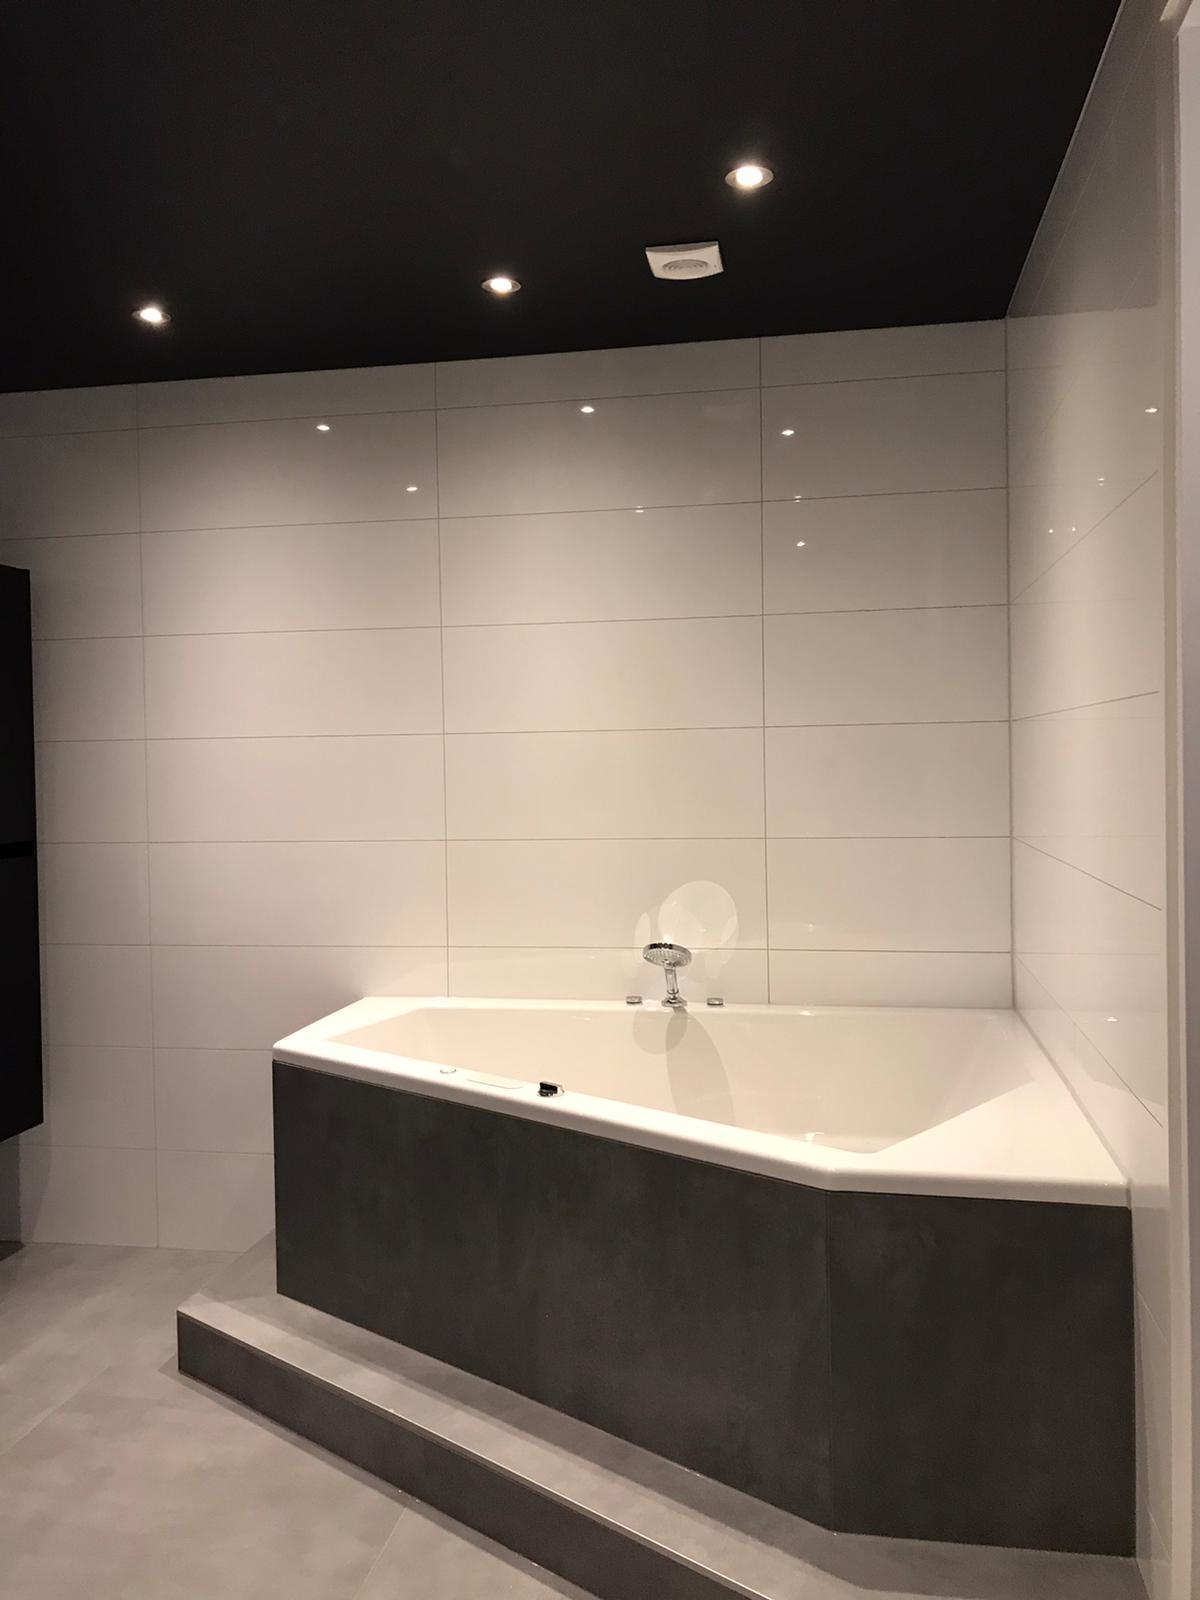 spanplafond met led spots boven uw bad